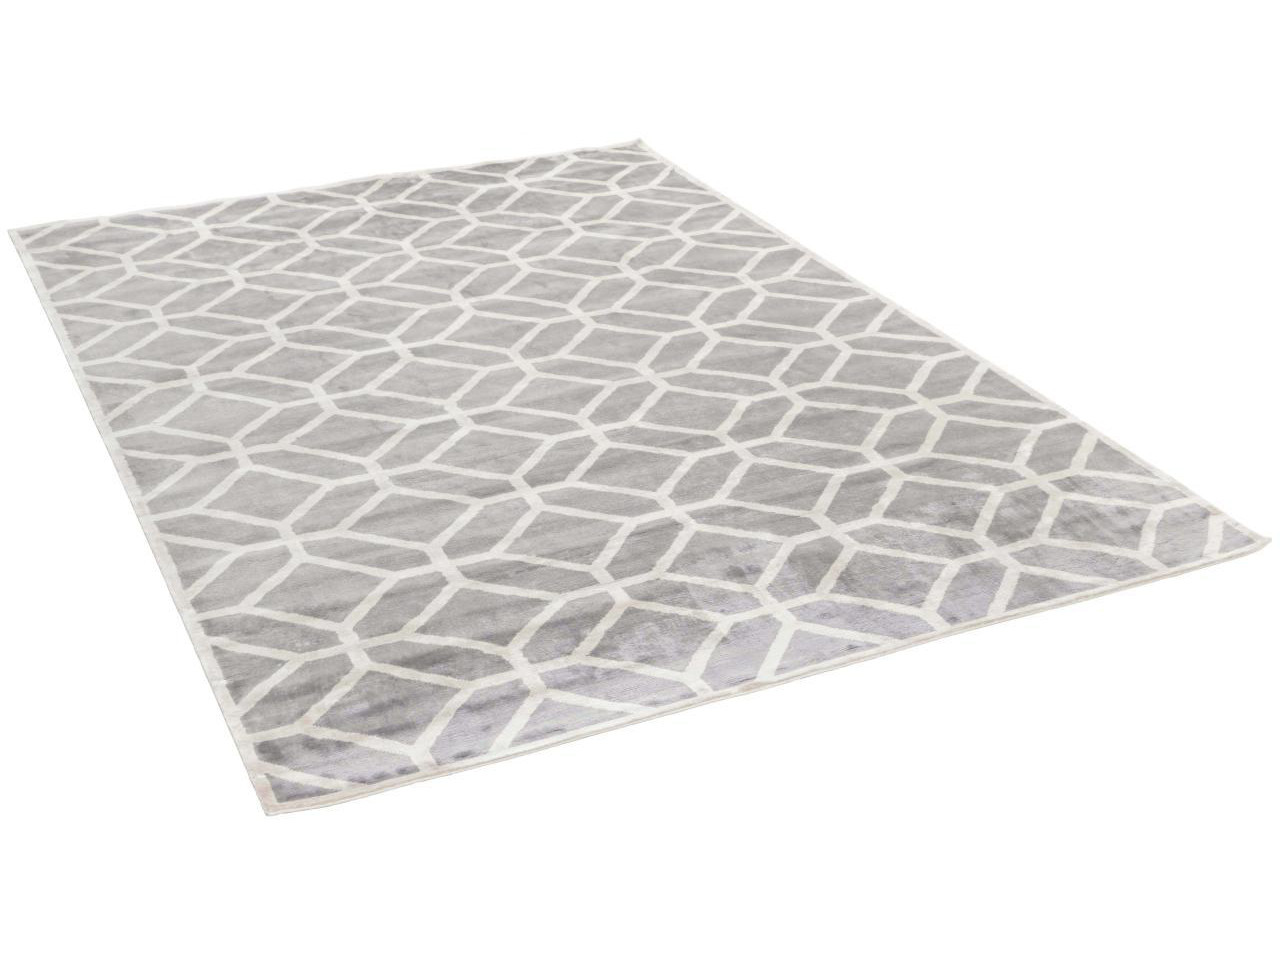 Cosmou nouveau tapis design n 35418 300x250cm - Tapis 200x140 ...